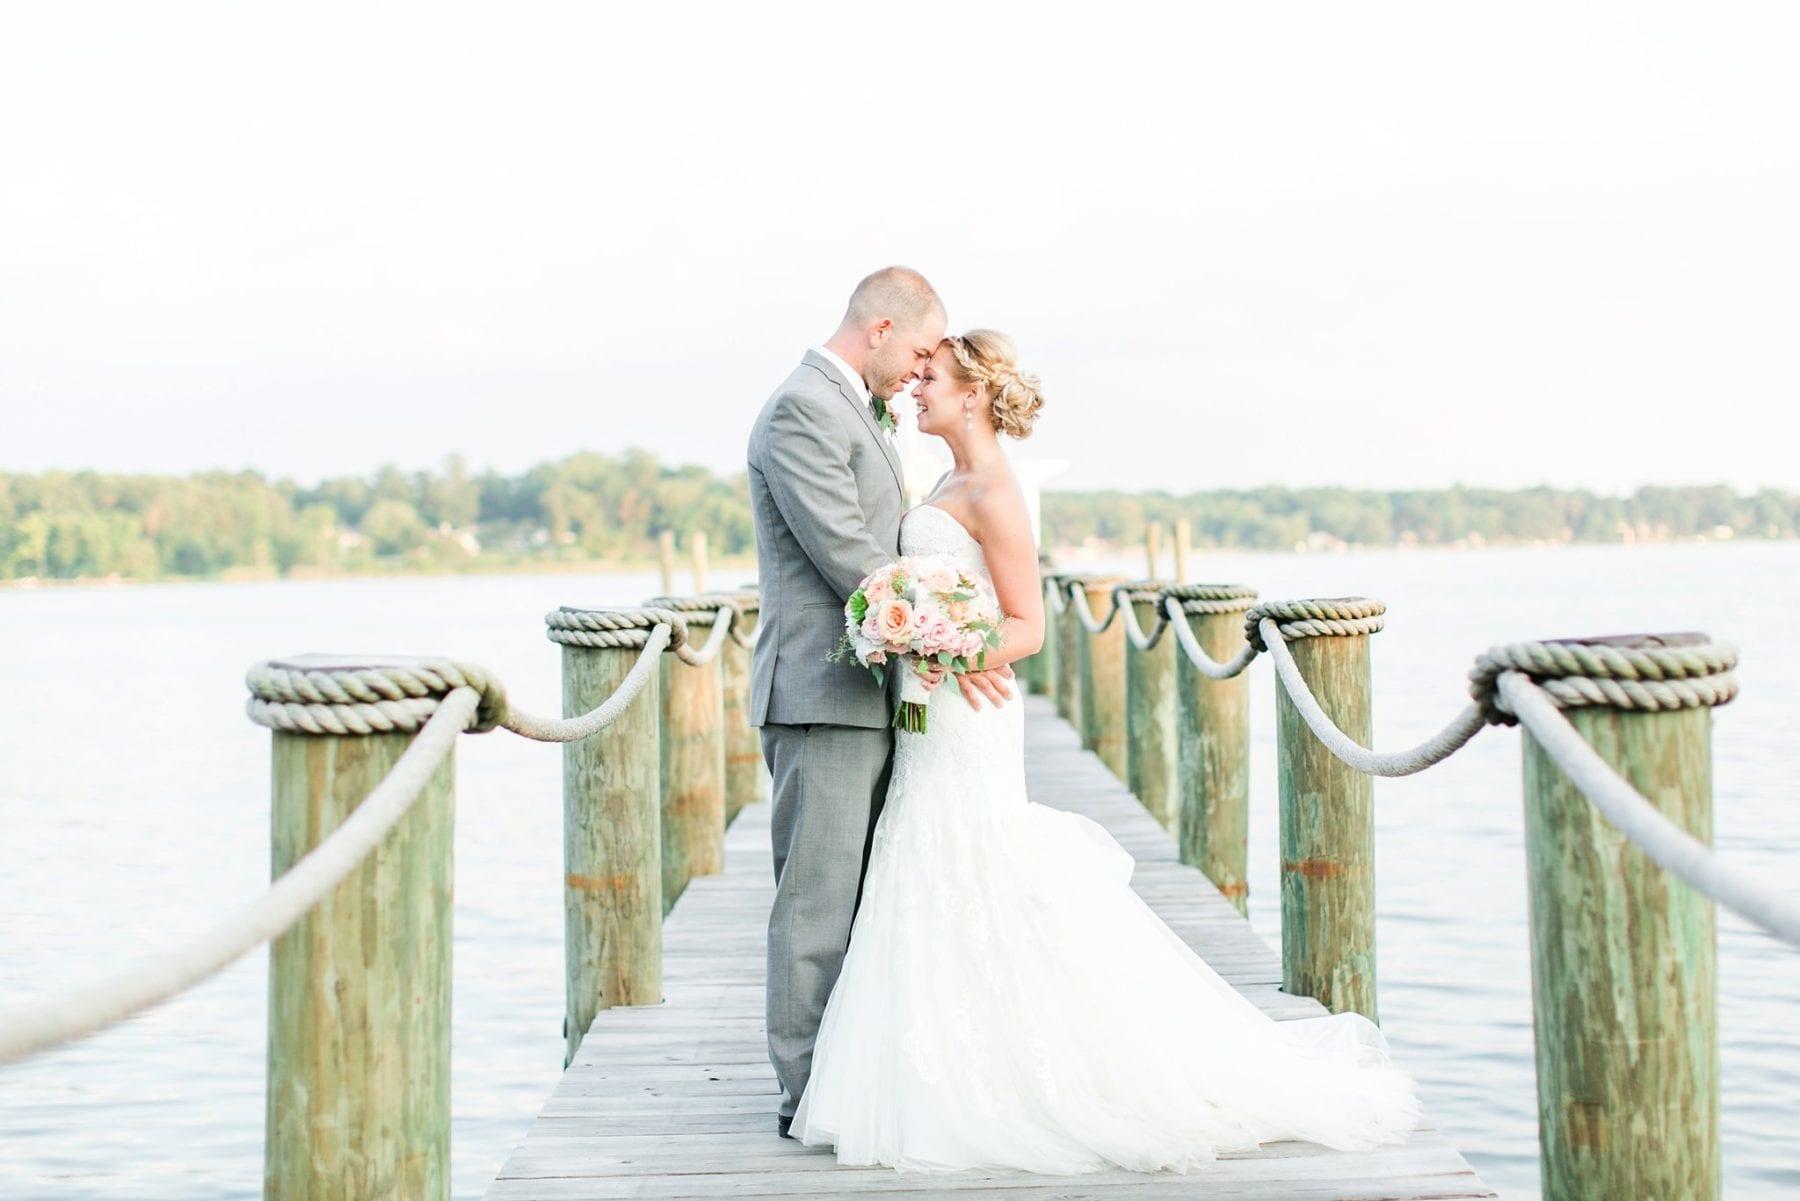 Waters Edge Wedding Photos Maryland Wedding Photographer Megan Kelsey Photography Katie & Conor-542.JPG